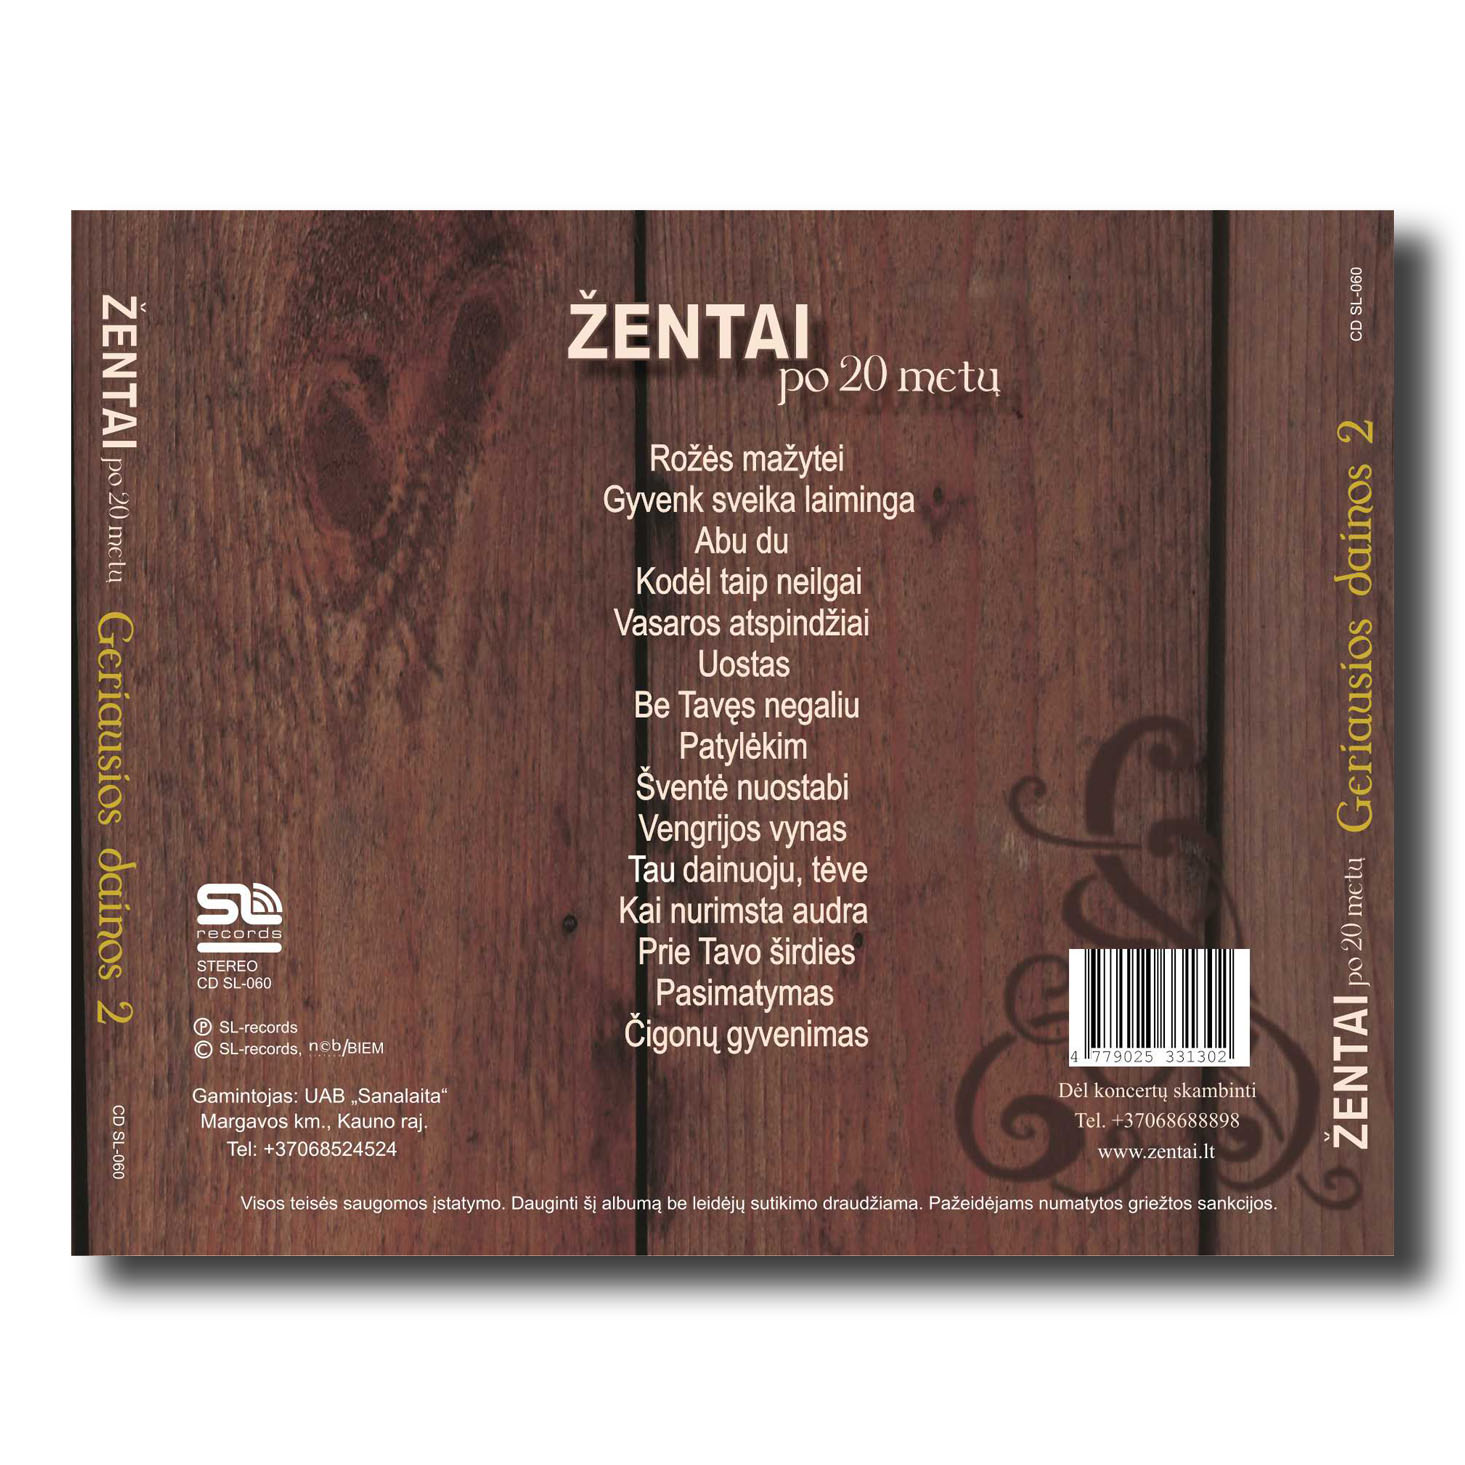 zentai bukletai (back)